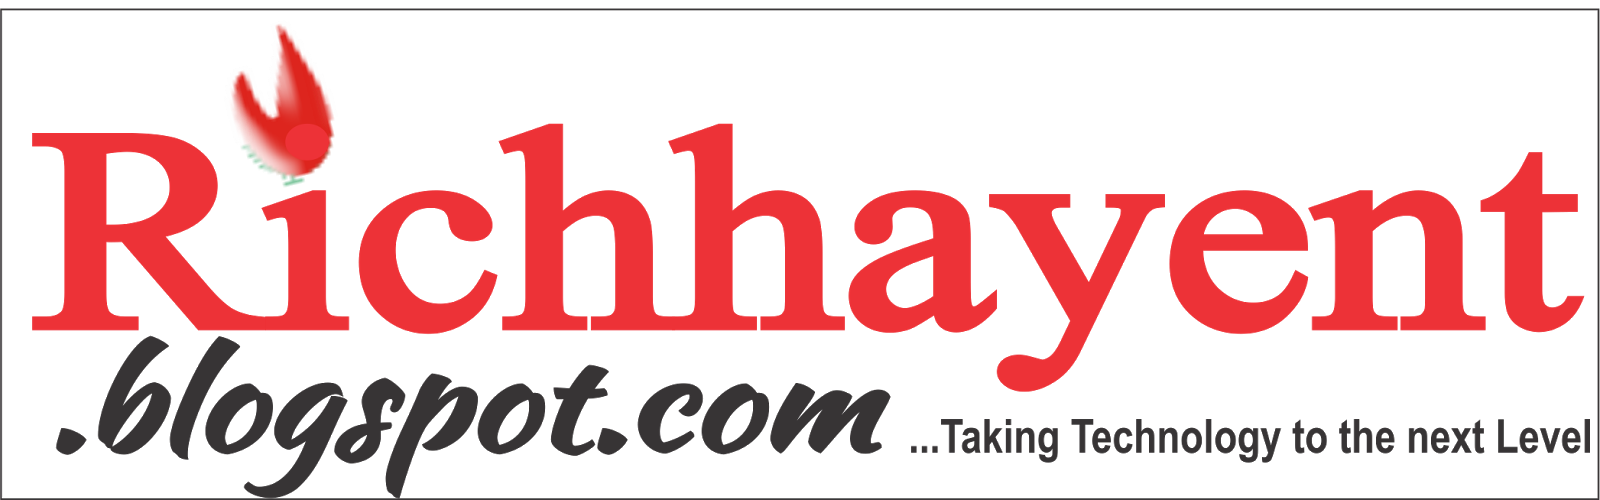 best websites to download season films richhayent blogs